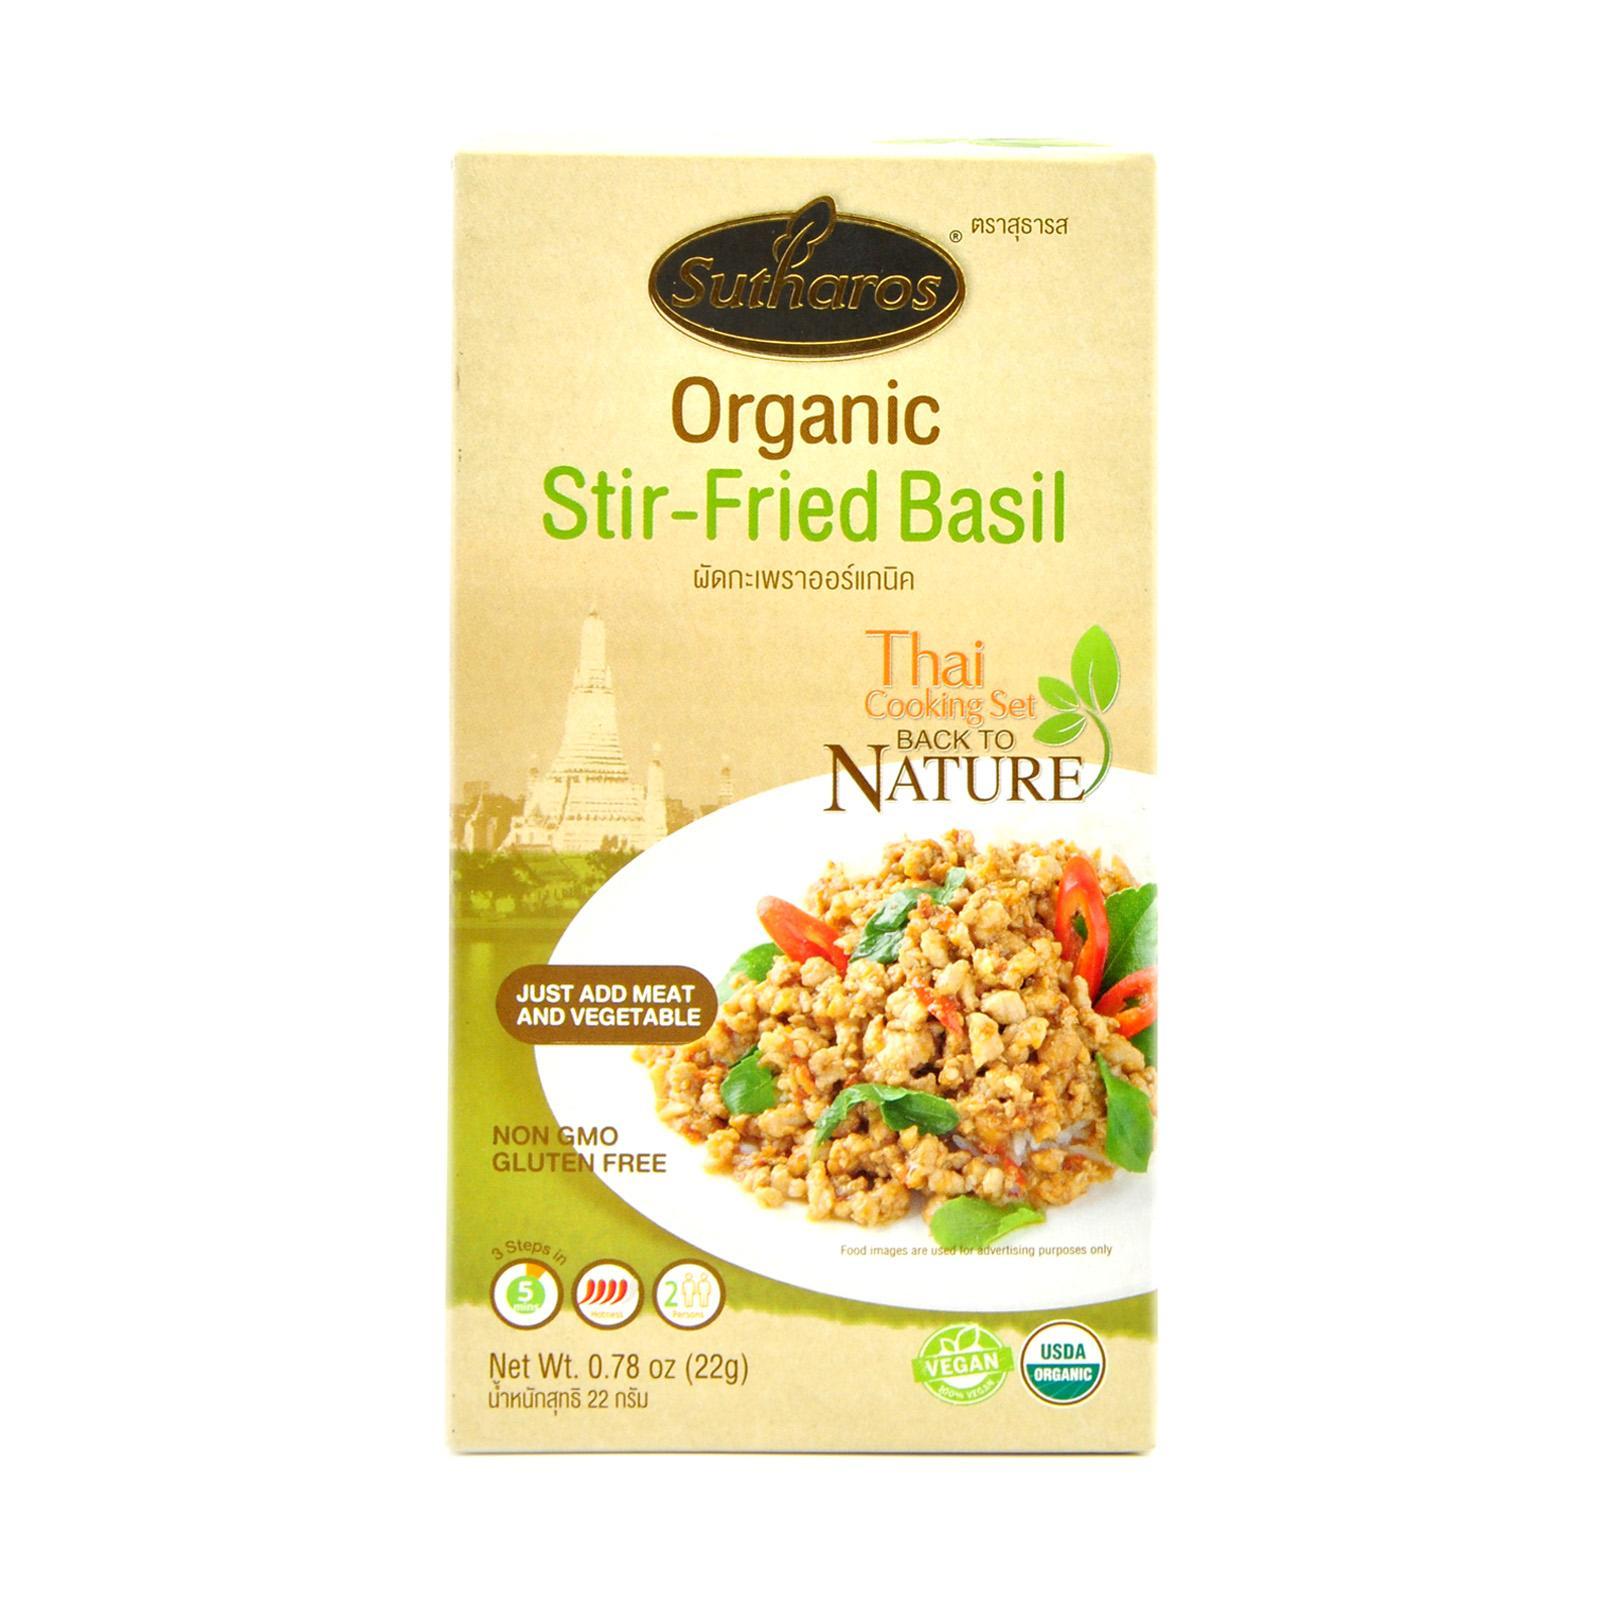 Sutharos Organic Stir-Fried Basil (3 Boxes) By Lifewinners Organic & Fine Foods.